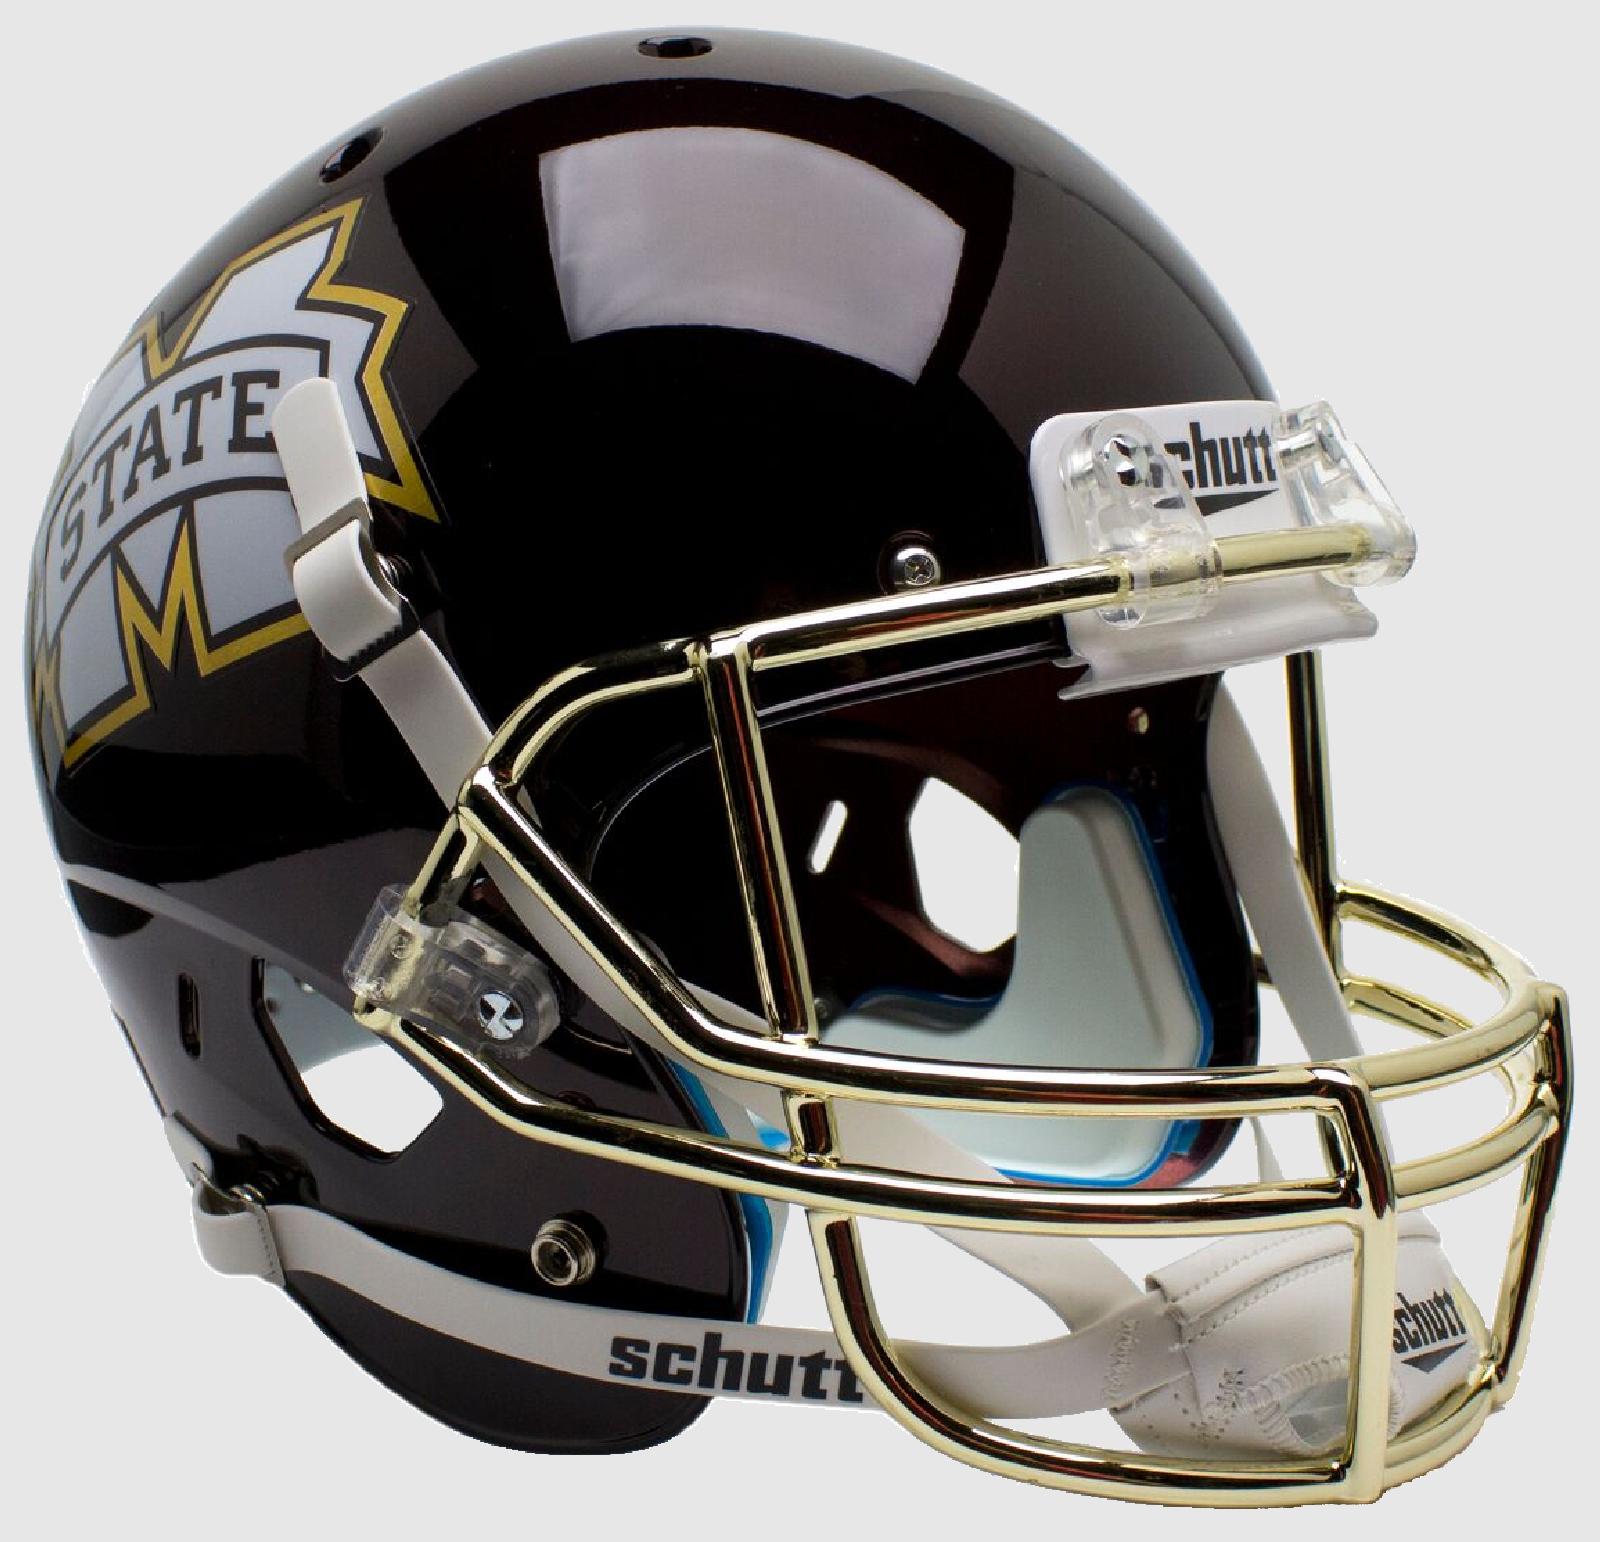 Mississippi State Bulldogs Full XP Replica Football Helmet Schutt <B>Chrome Gold Mask</B>